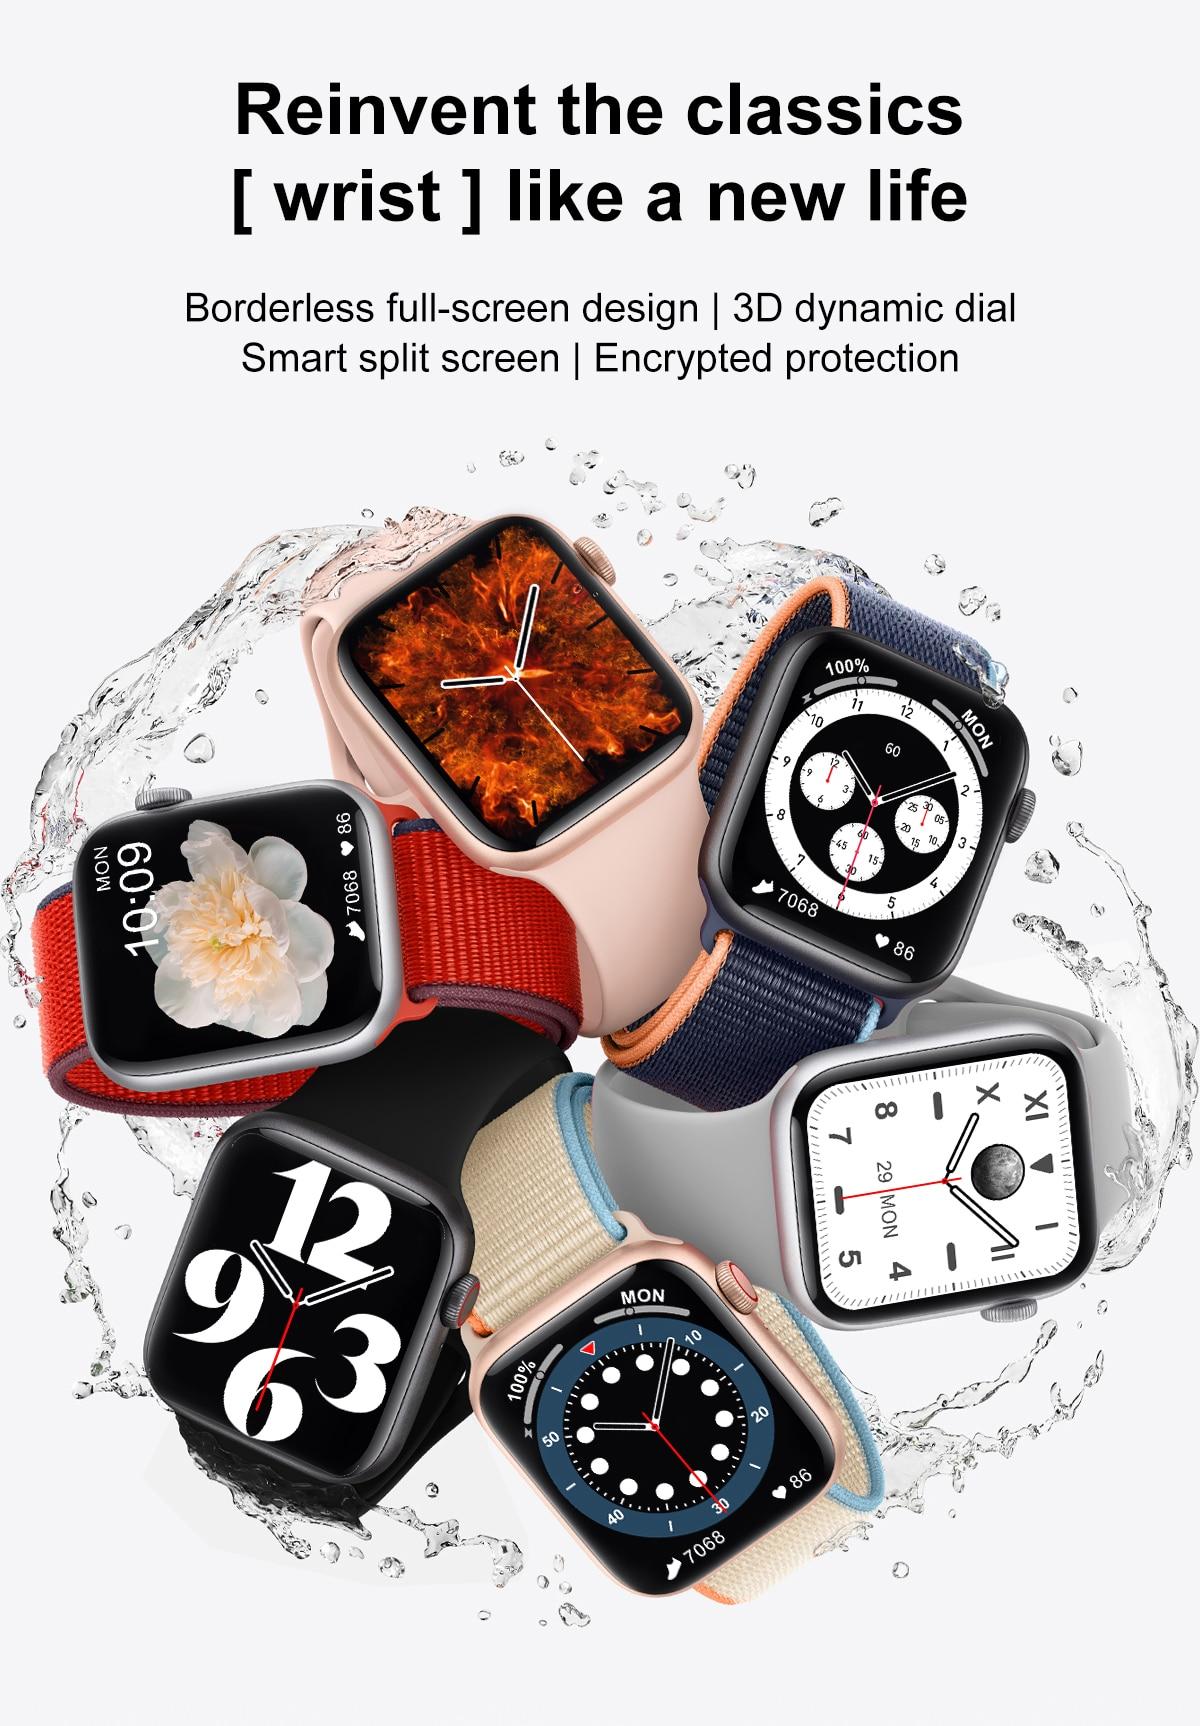 H85ab9aeb429546e5aab43ba3649eb249S DT100 pro Smart Watch Bluetooth Call Custom Dynamic Watch Face IP68 Waterproof Smartwatch Men Women for Apple Watch Iwo W26